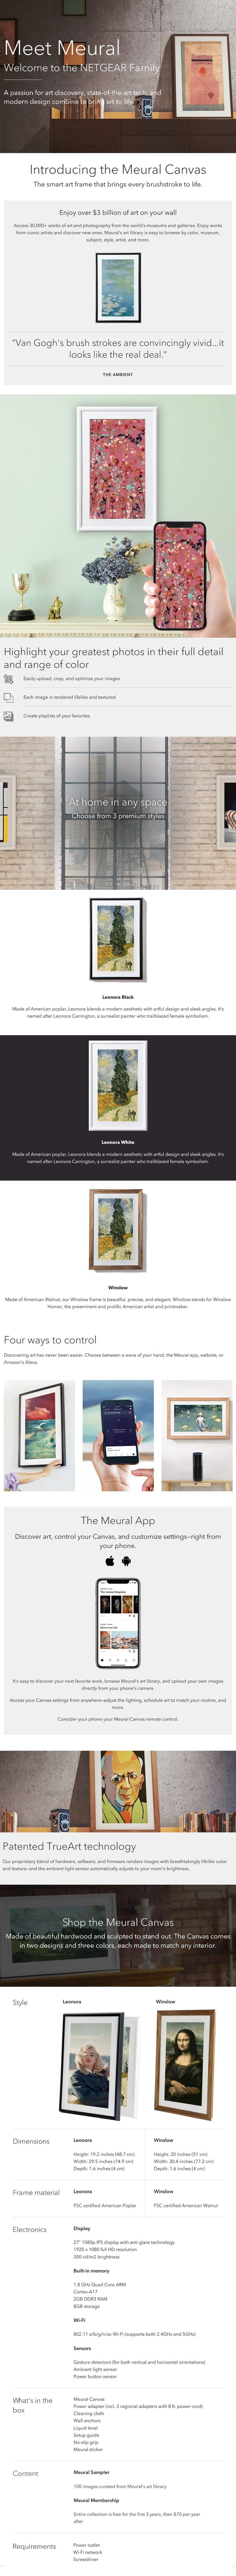 "Netgear Meural 27"" Smart Art Frame - Leonora White - Desktop Overview 1"